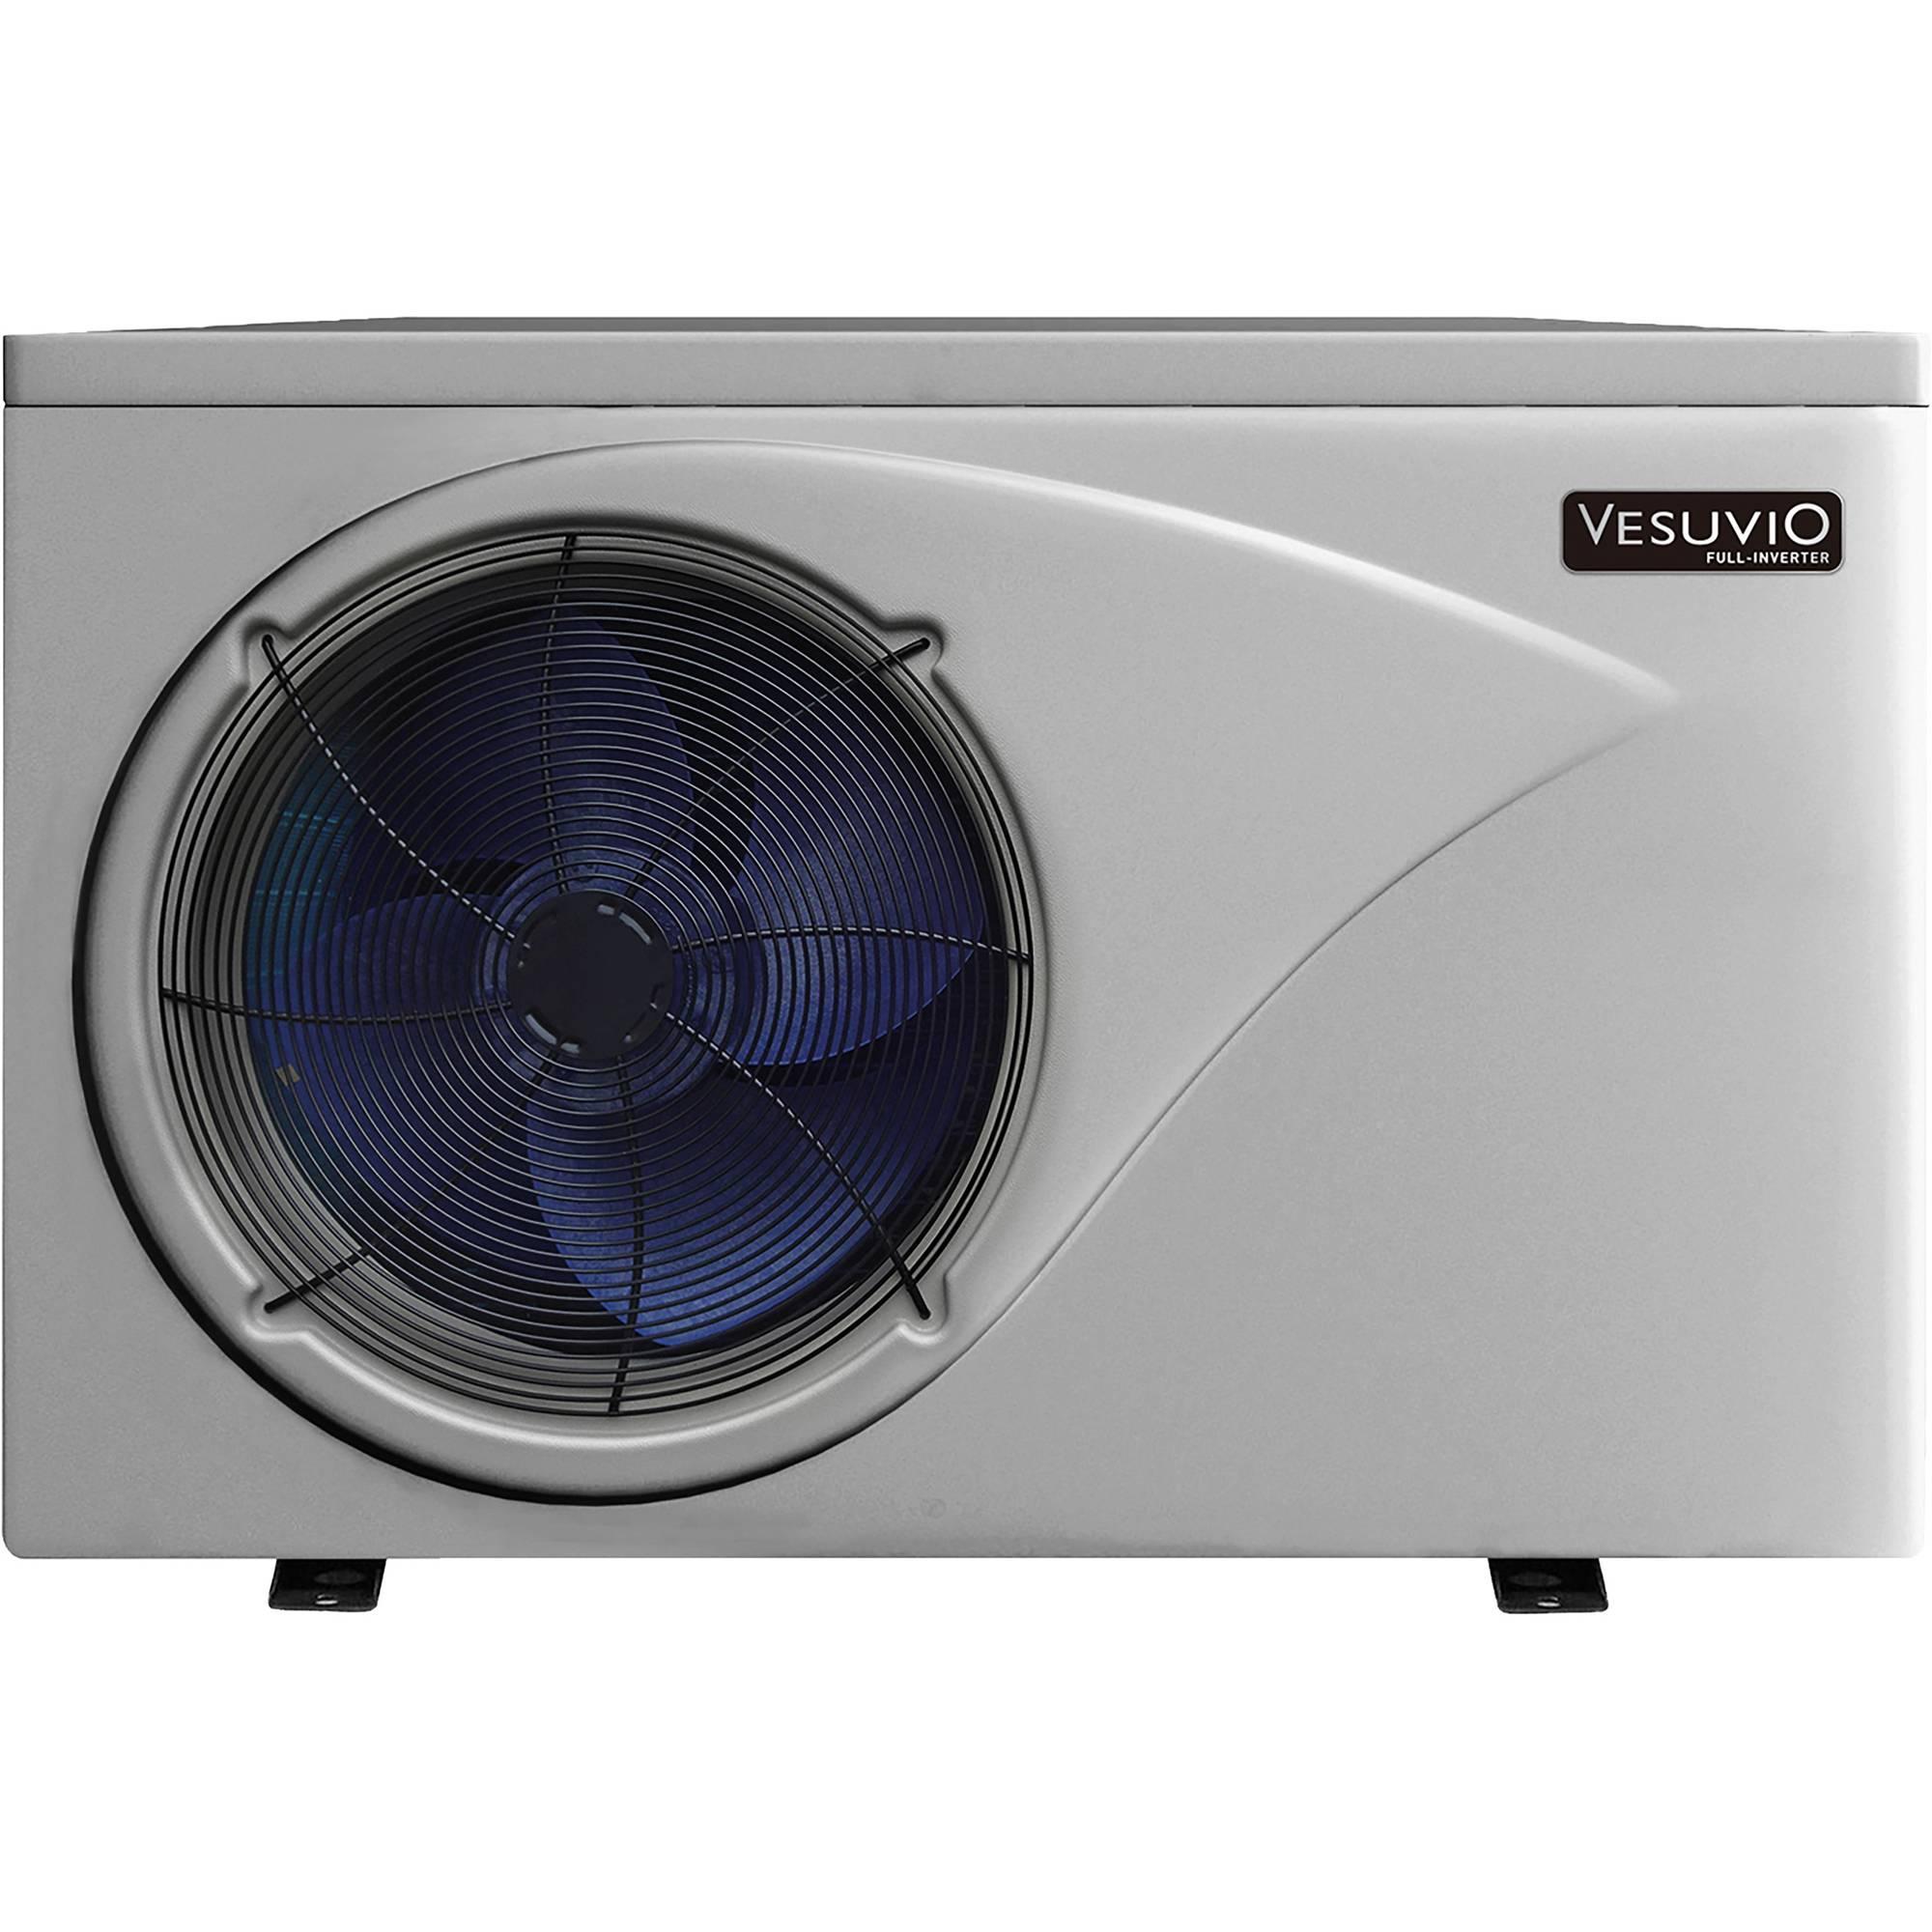 VESUVIO Inverter 8 kW